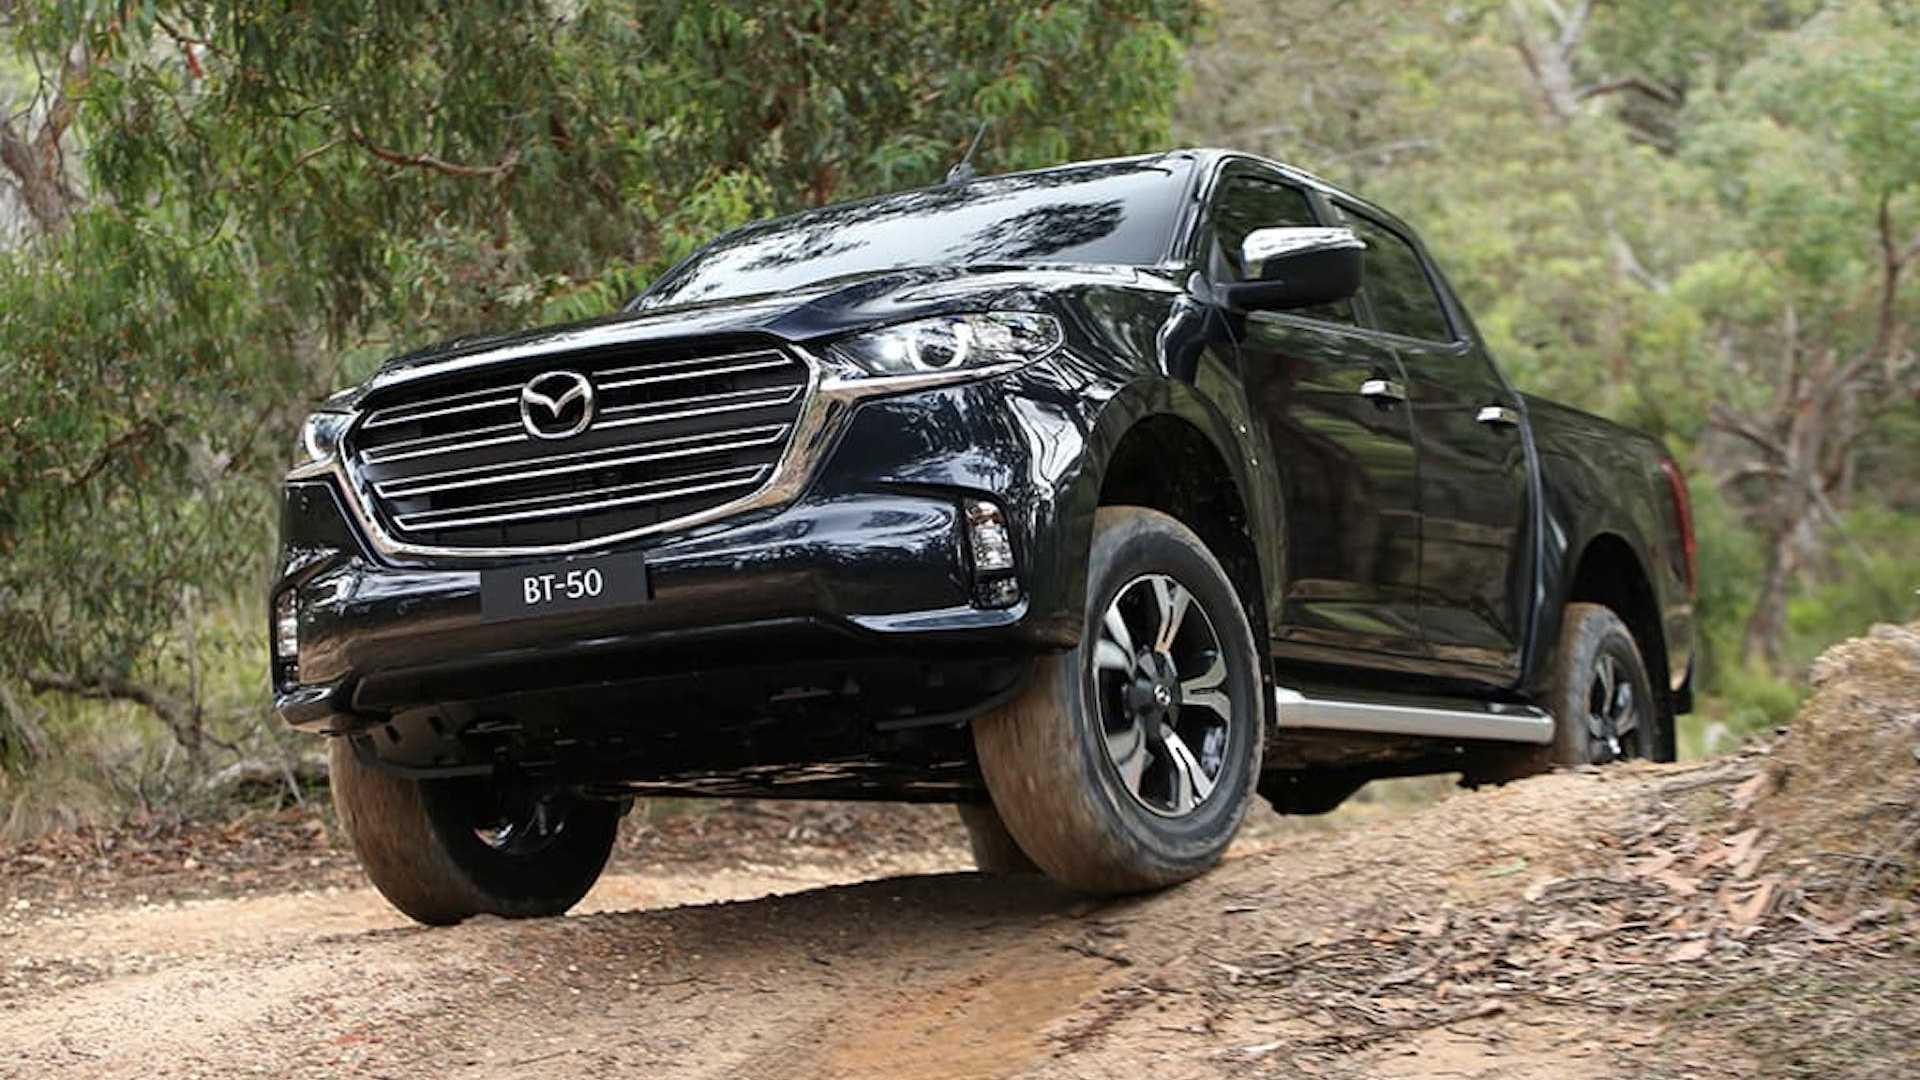 Kelebihan Kekurangan Mazda Bt Review